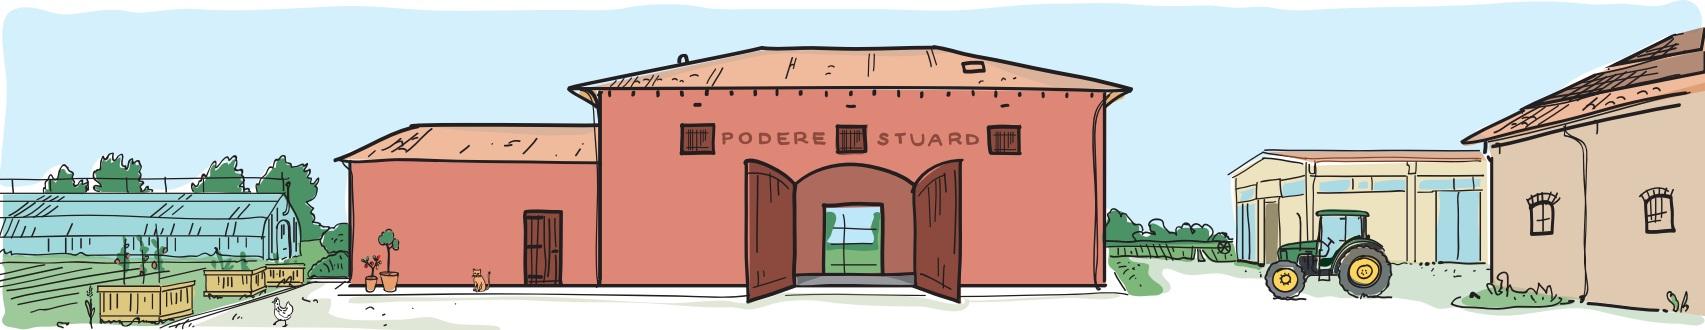 Azienda Stuard